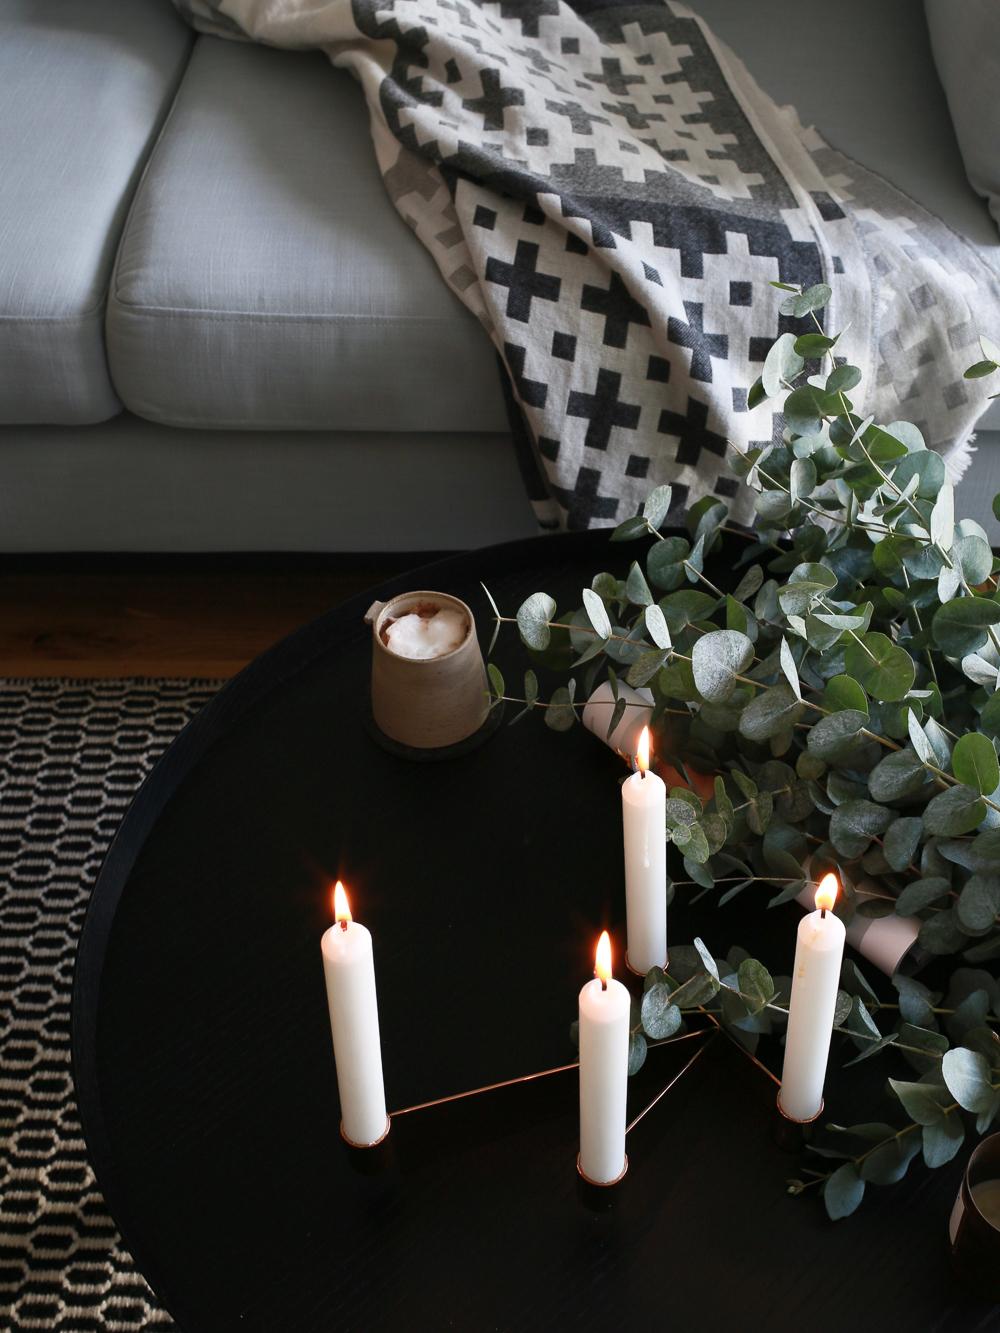 Georg Jensen Urkiola candleholder